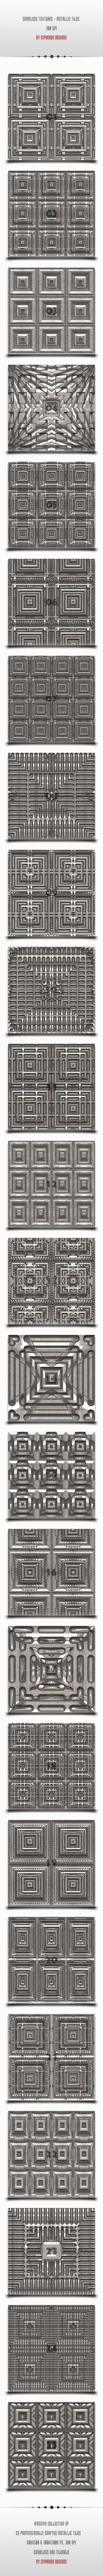 Seamless Textures Metallic Tiles